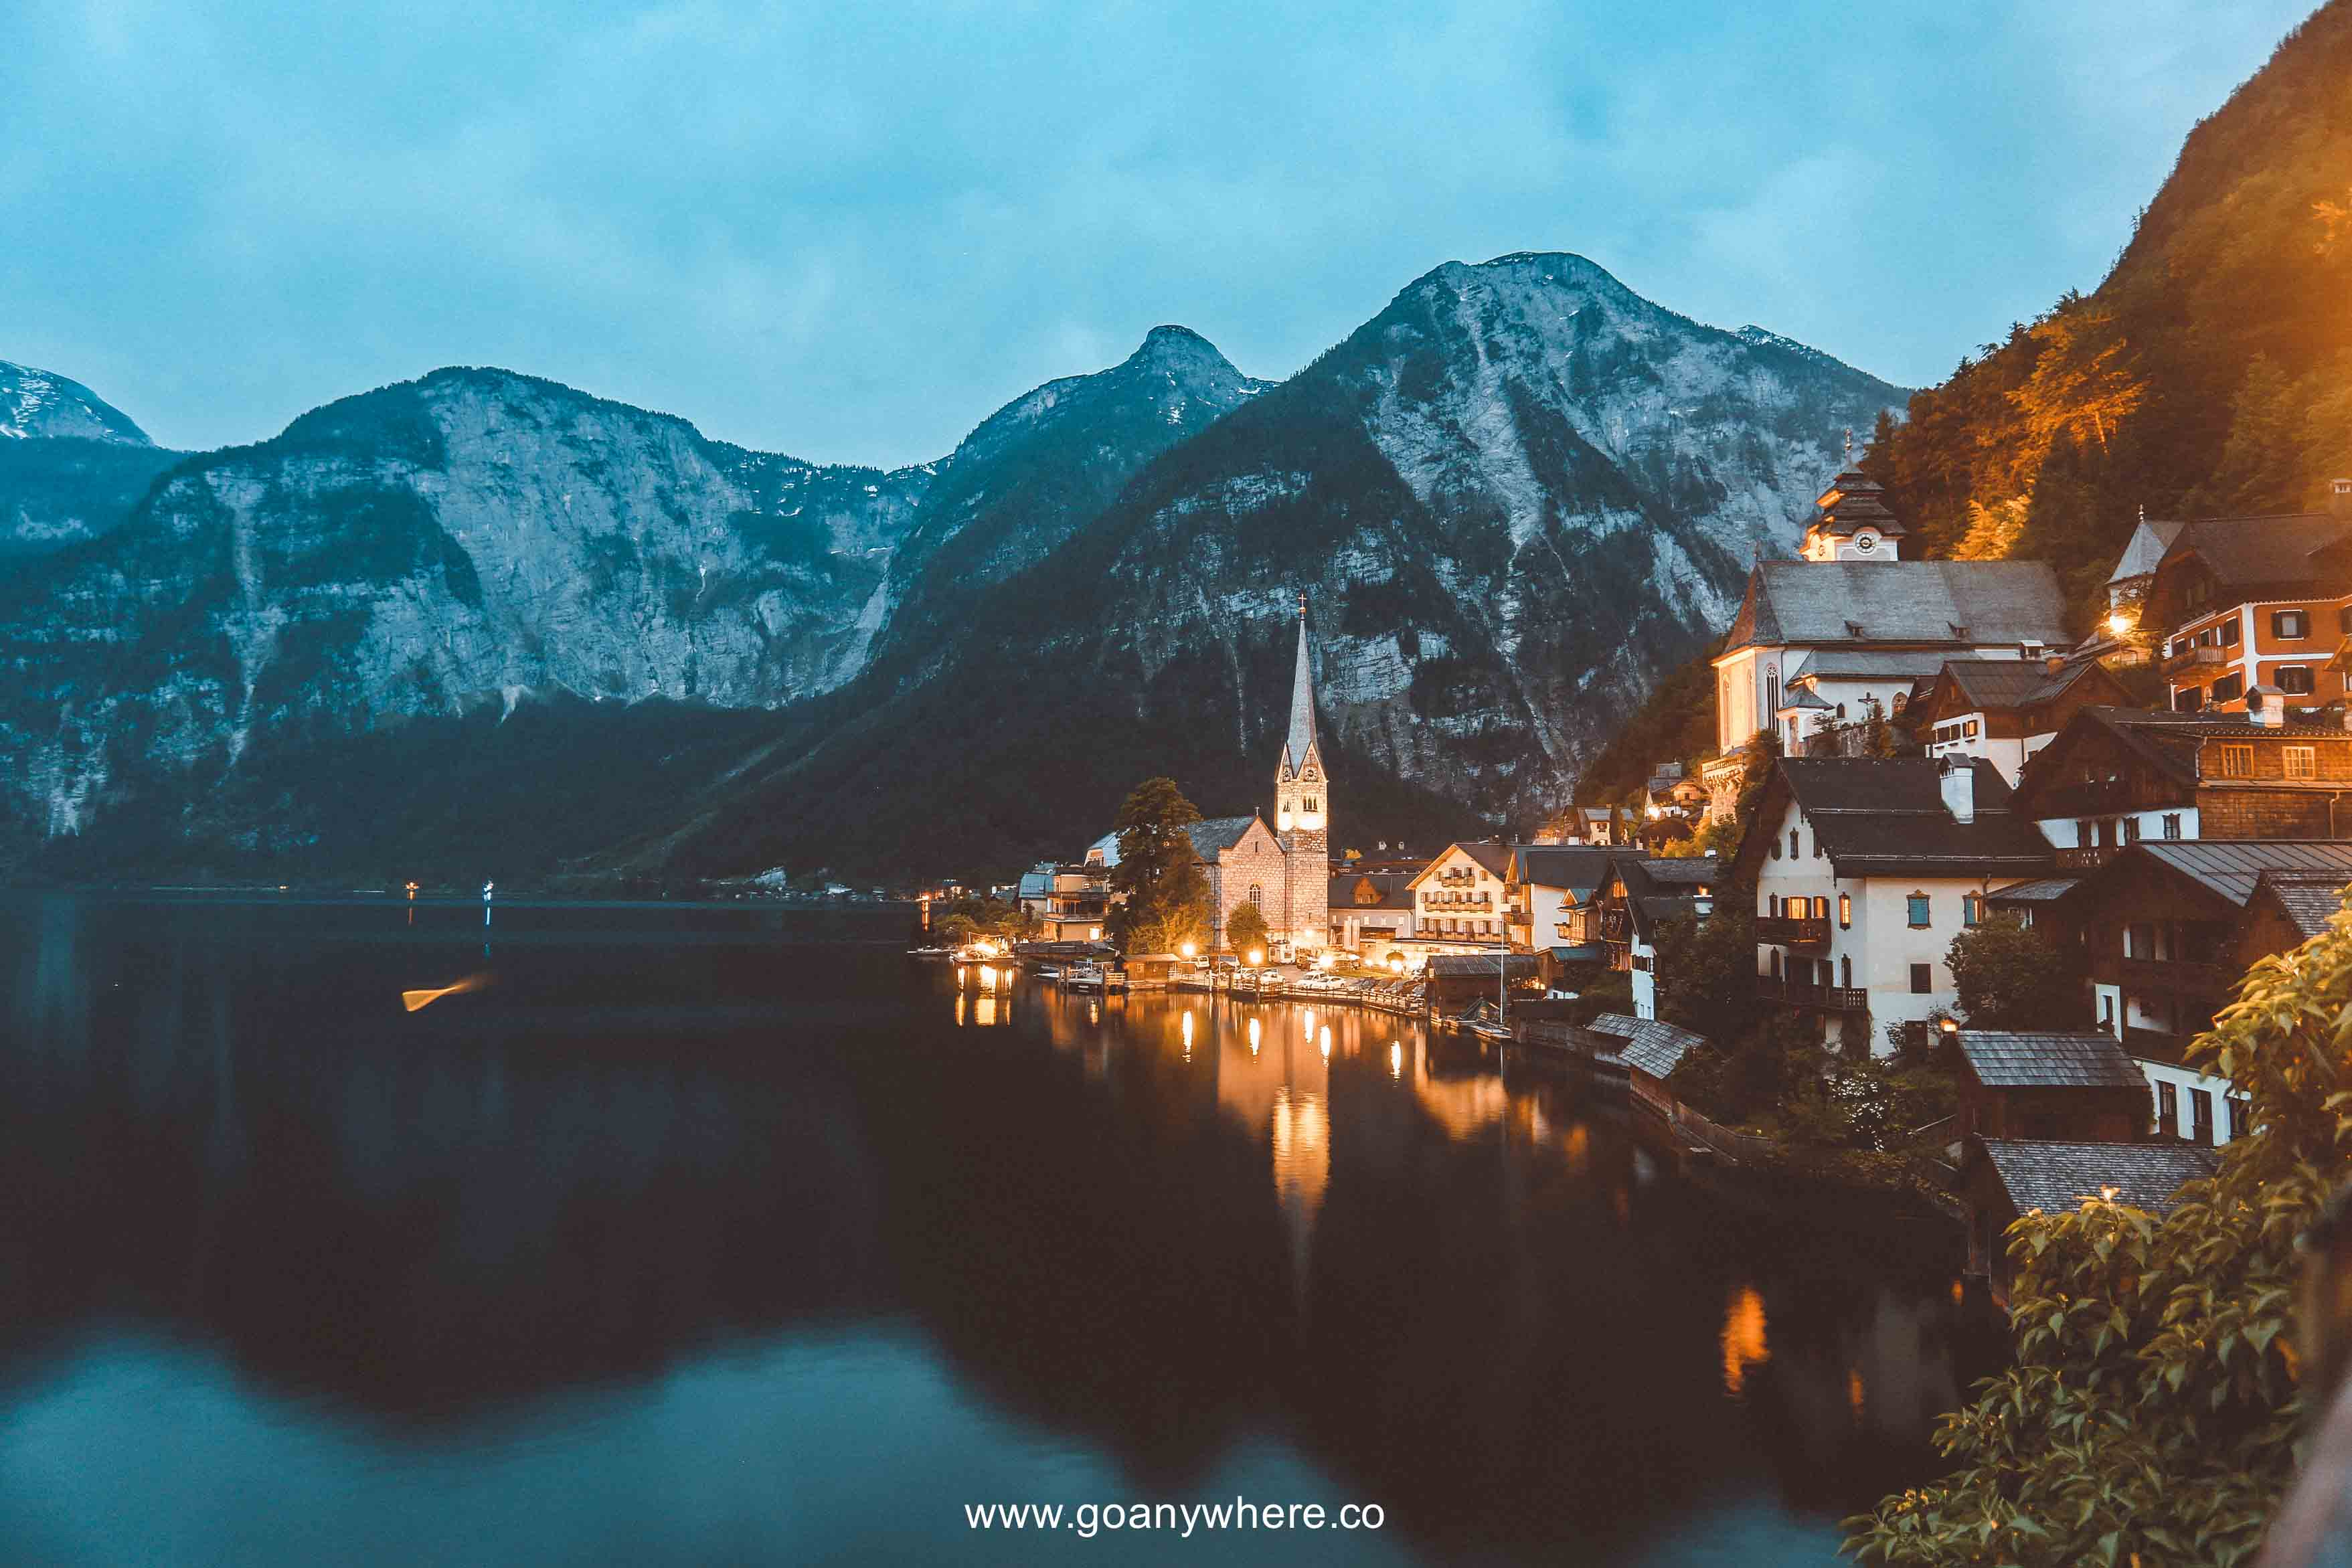 europe-austria-IMG_3387.JPG